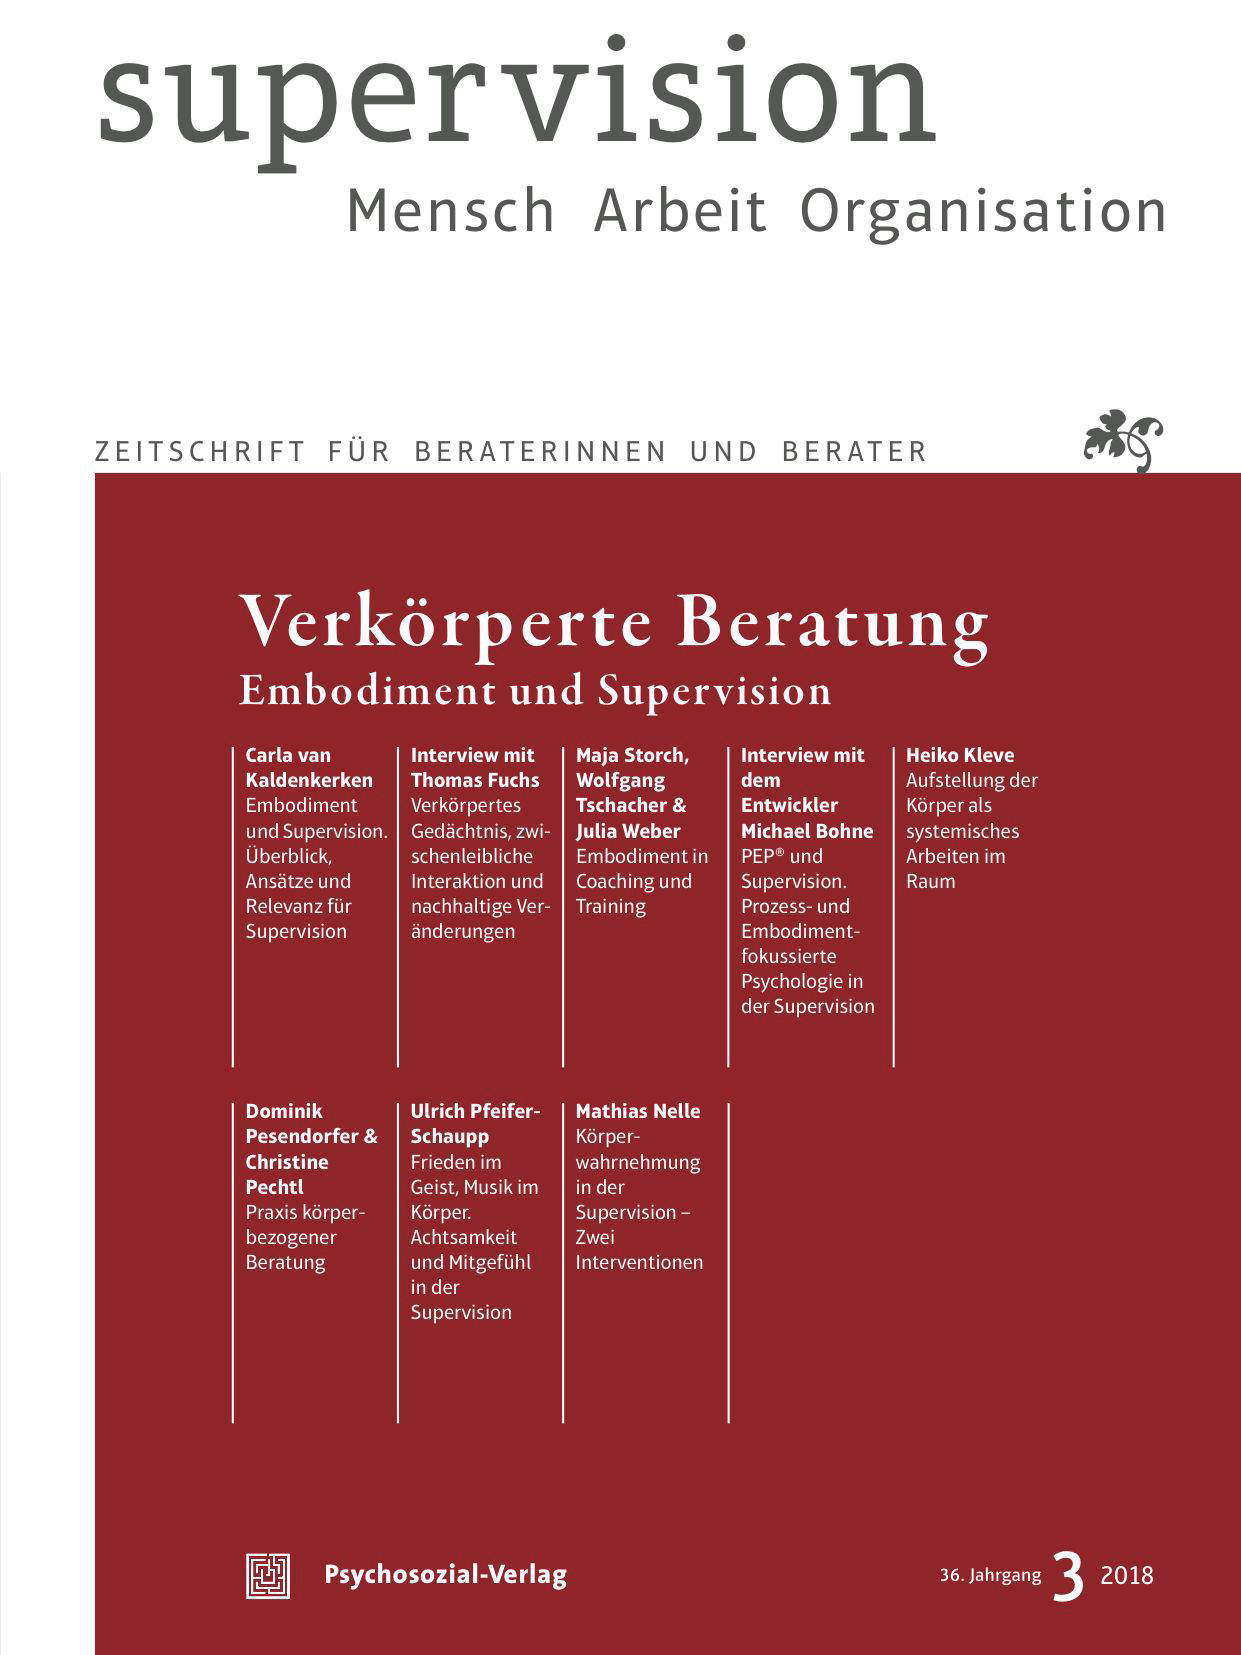 https://www.psychosozial-verlag.de/catalog/images/products/onix/8221.jpg